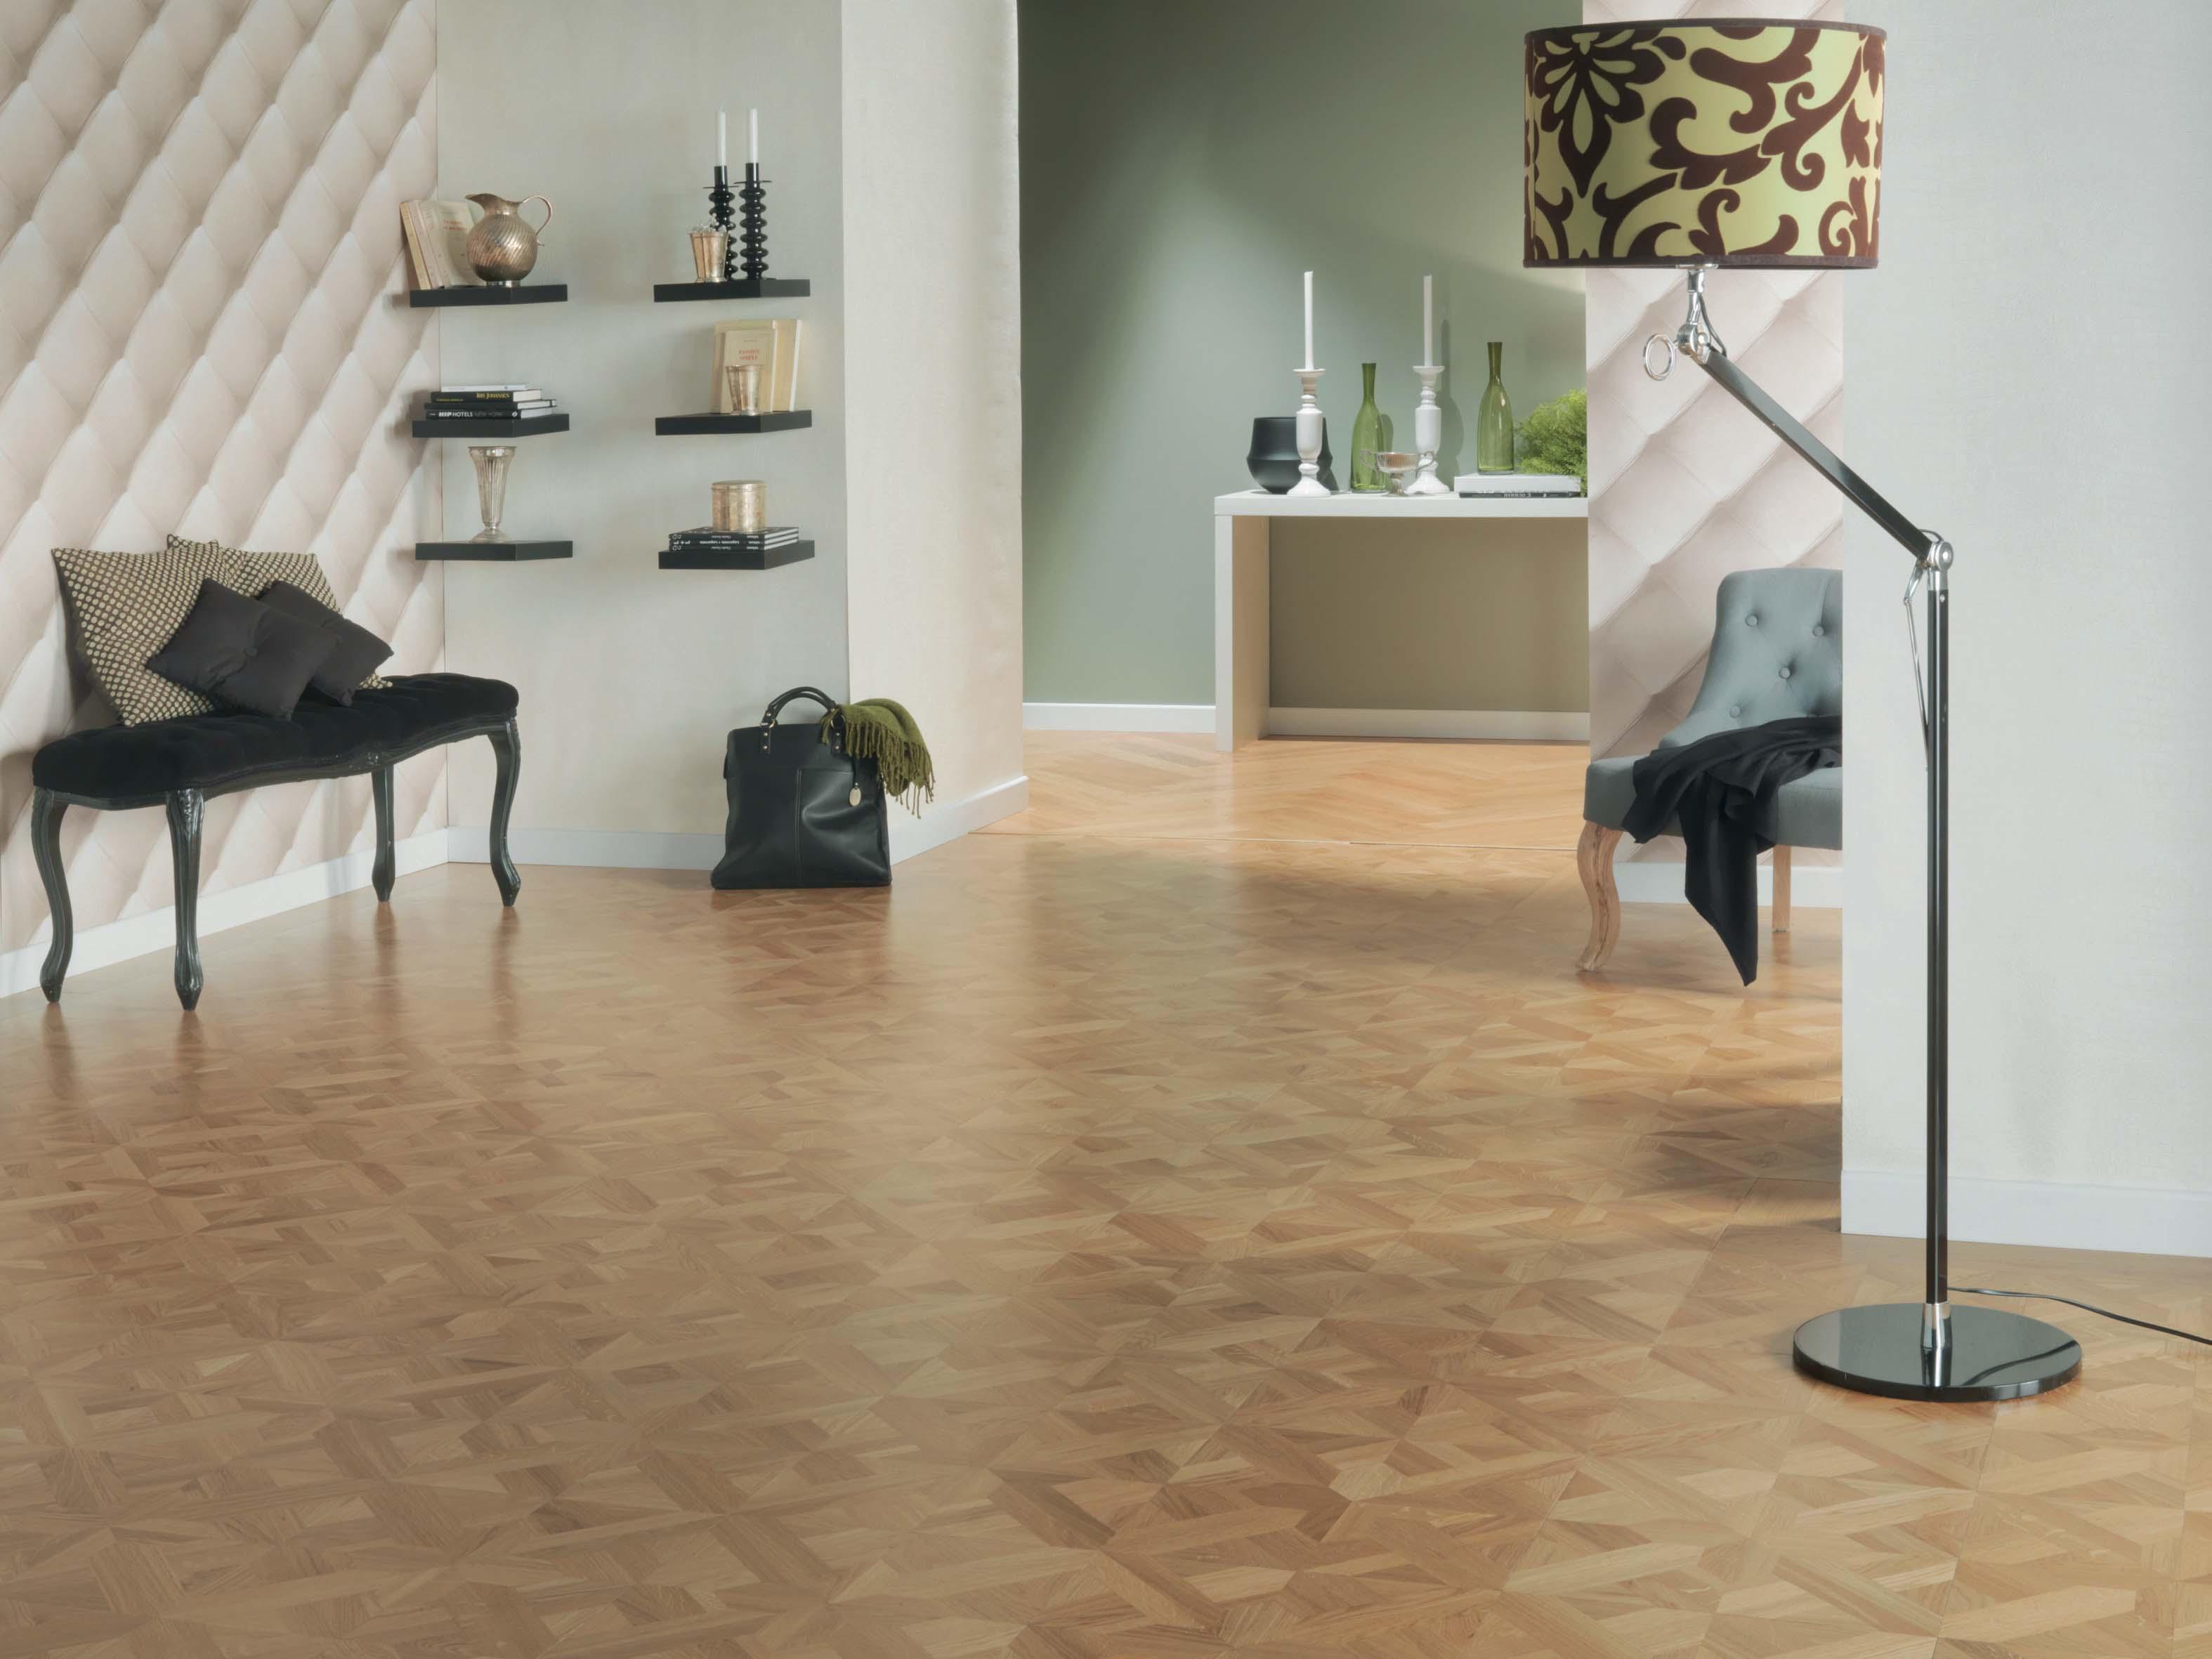 Panaget floor french oak classic n°2 satin carmen - engineered wood floor